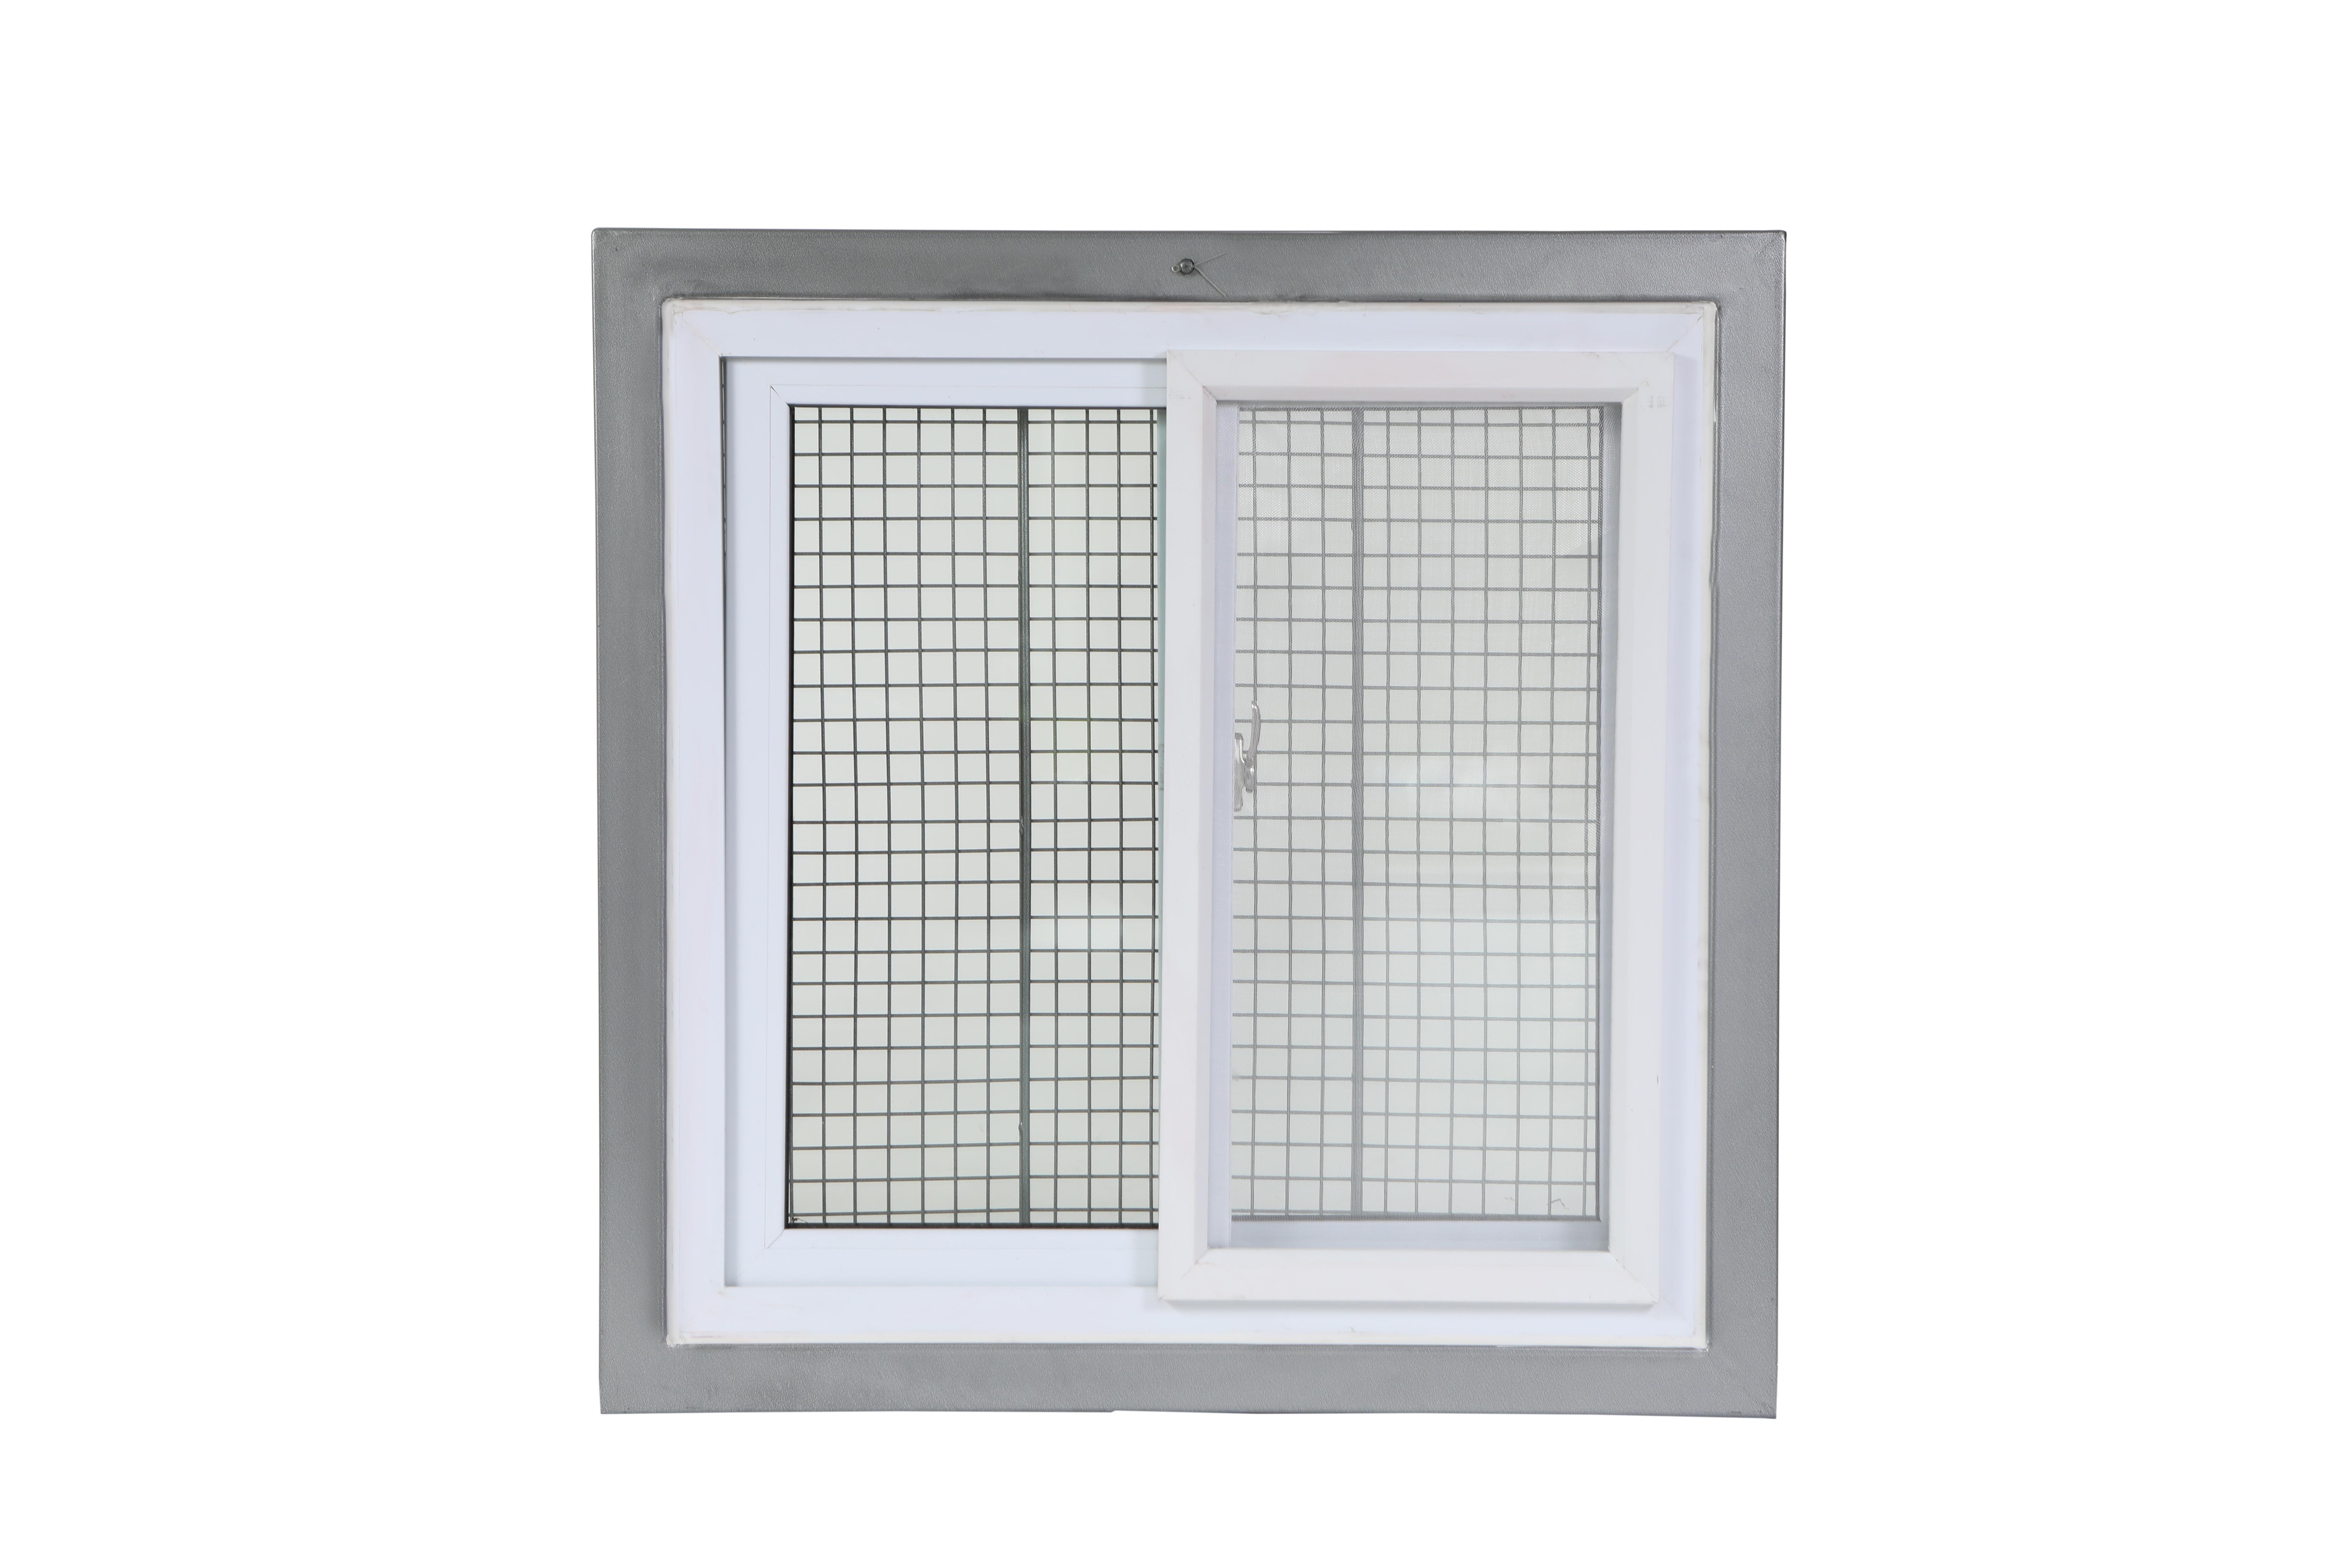 F1b.6066 - 3'x3' INSTA Frame and Window PVC2